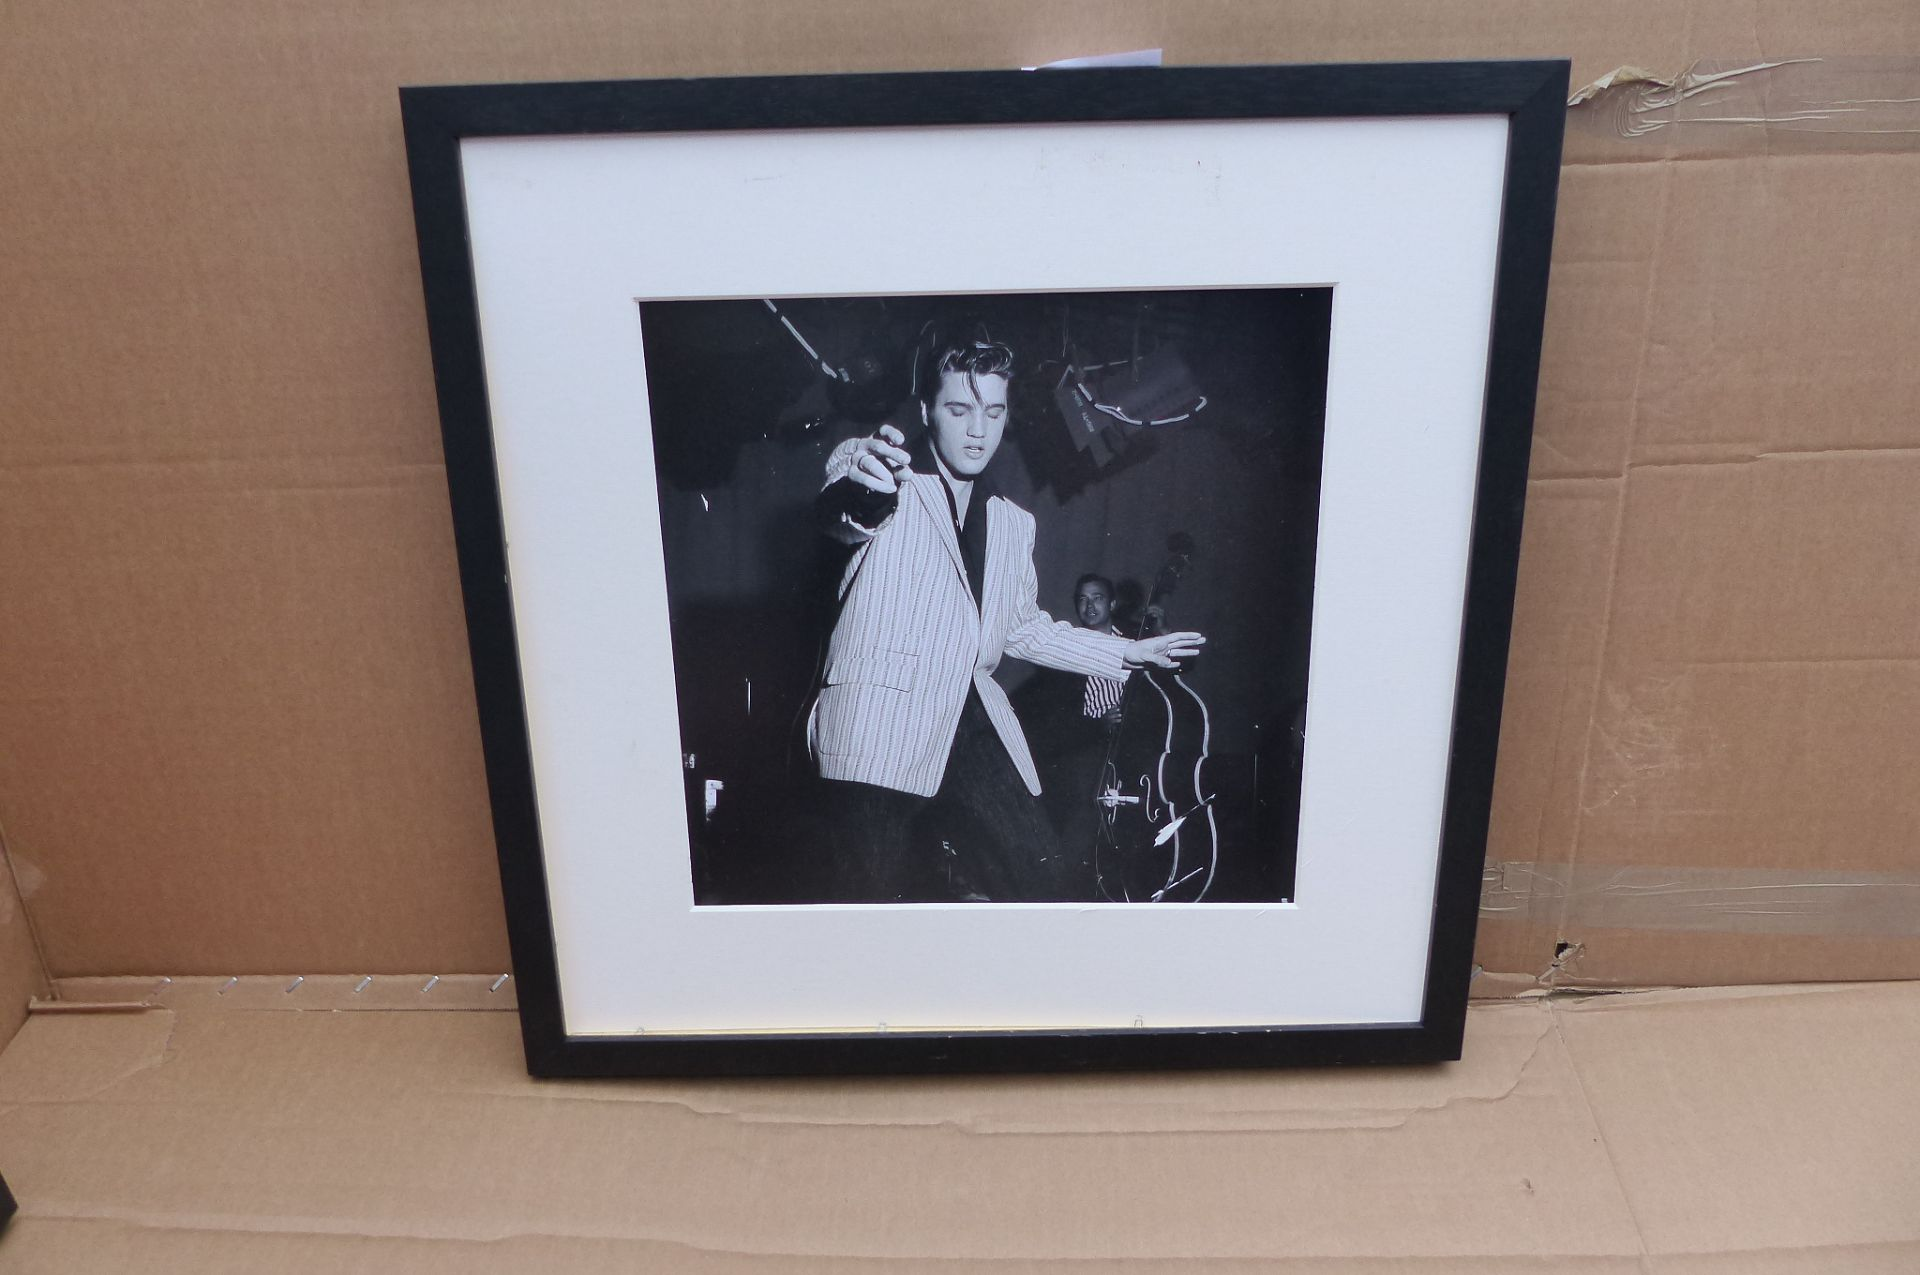 Getty Images Gallery - Elvis Presley Rehearsing Wood Framed Print & Mount, 59.5 x 59.5cm